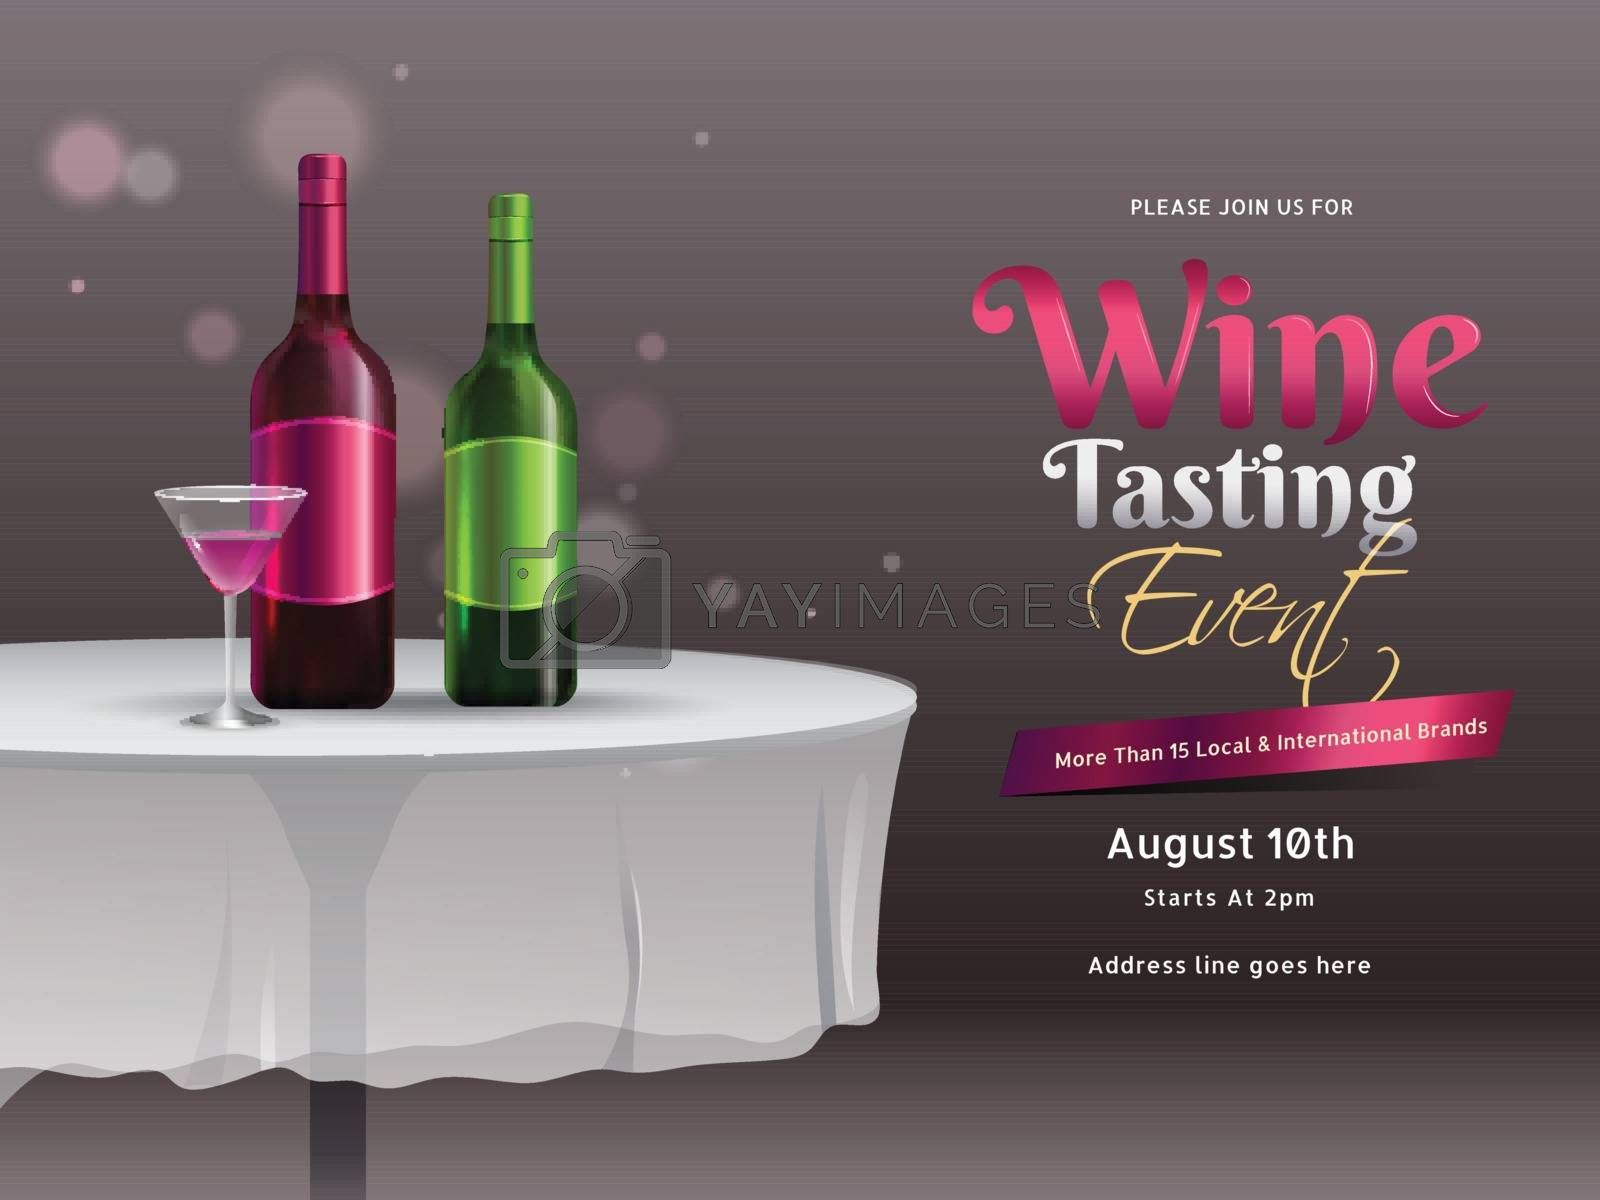 Illustration of wine bottles with drink glass on restaurant table for Wine Tasting event or party celebration banner or poster design.